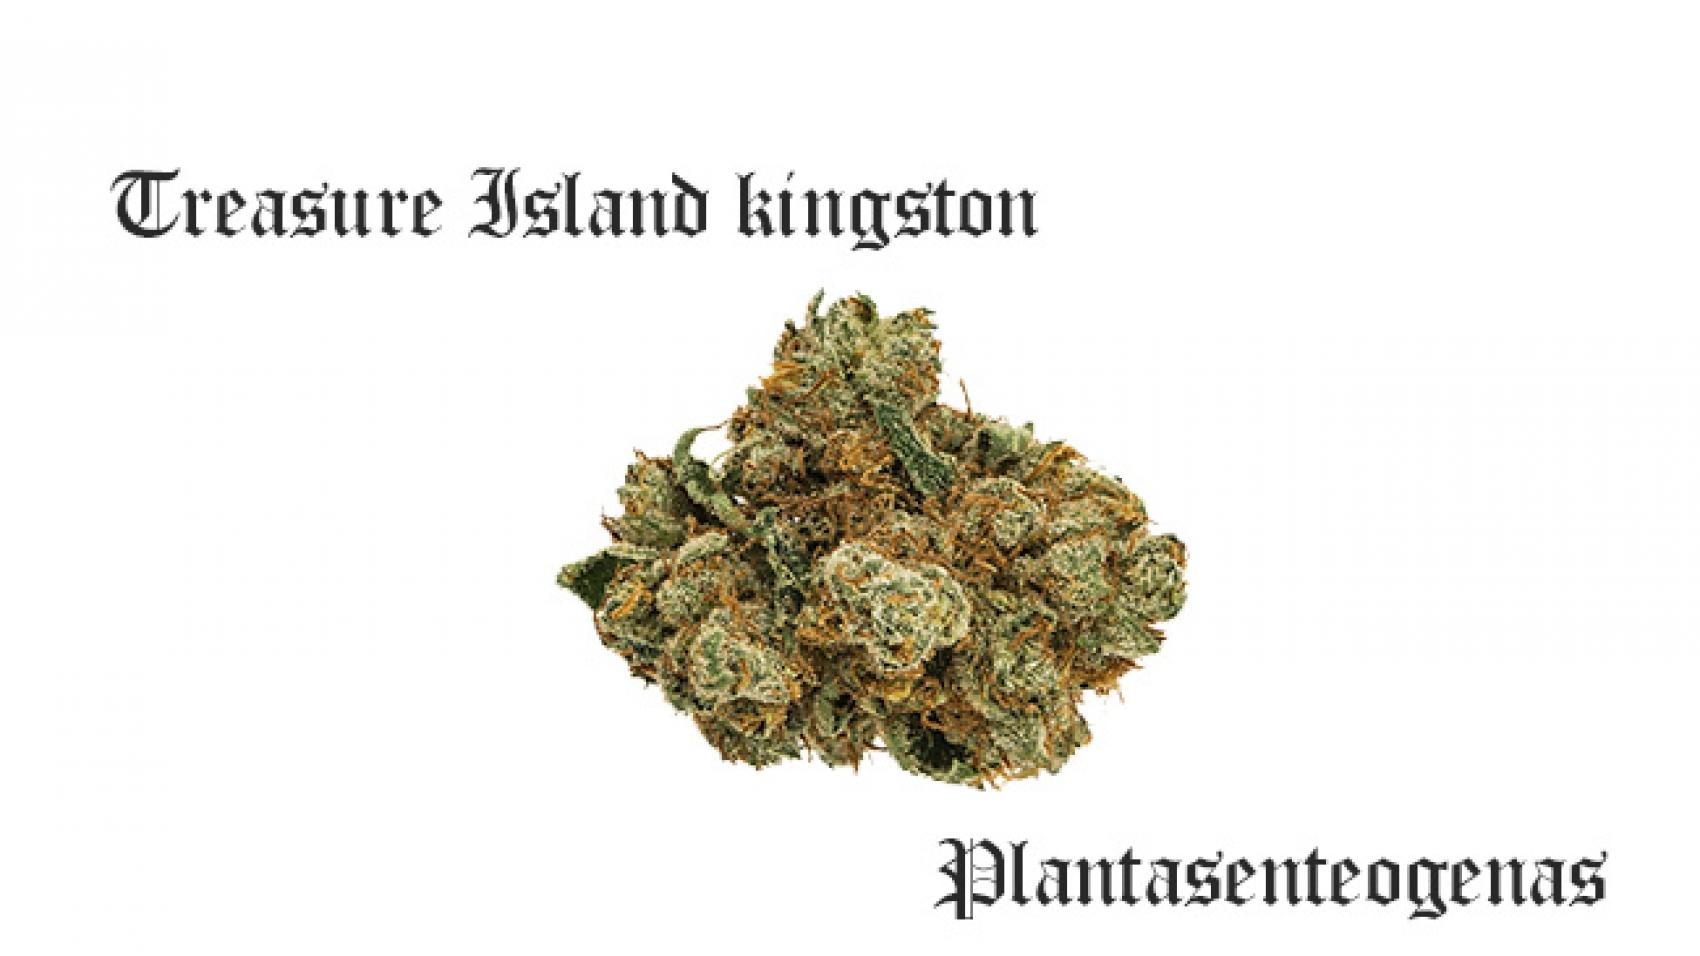 treasure island kingston